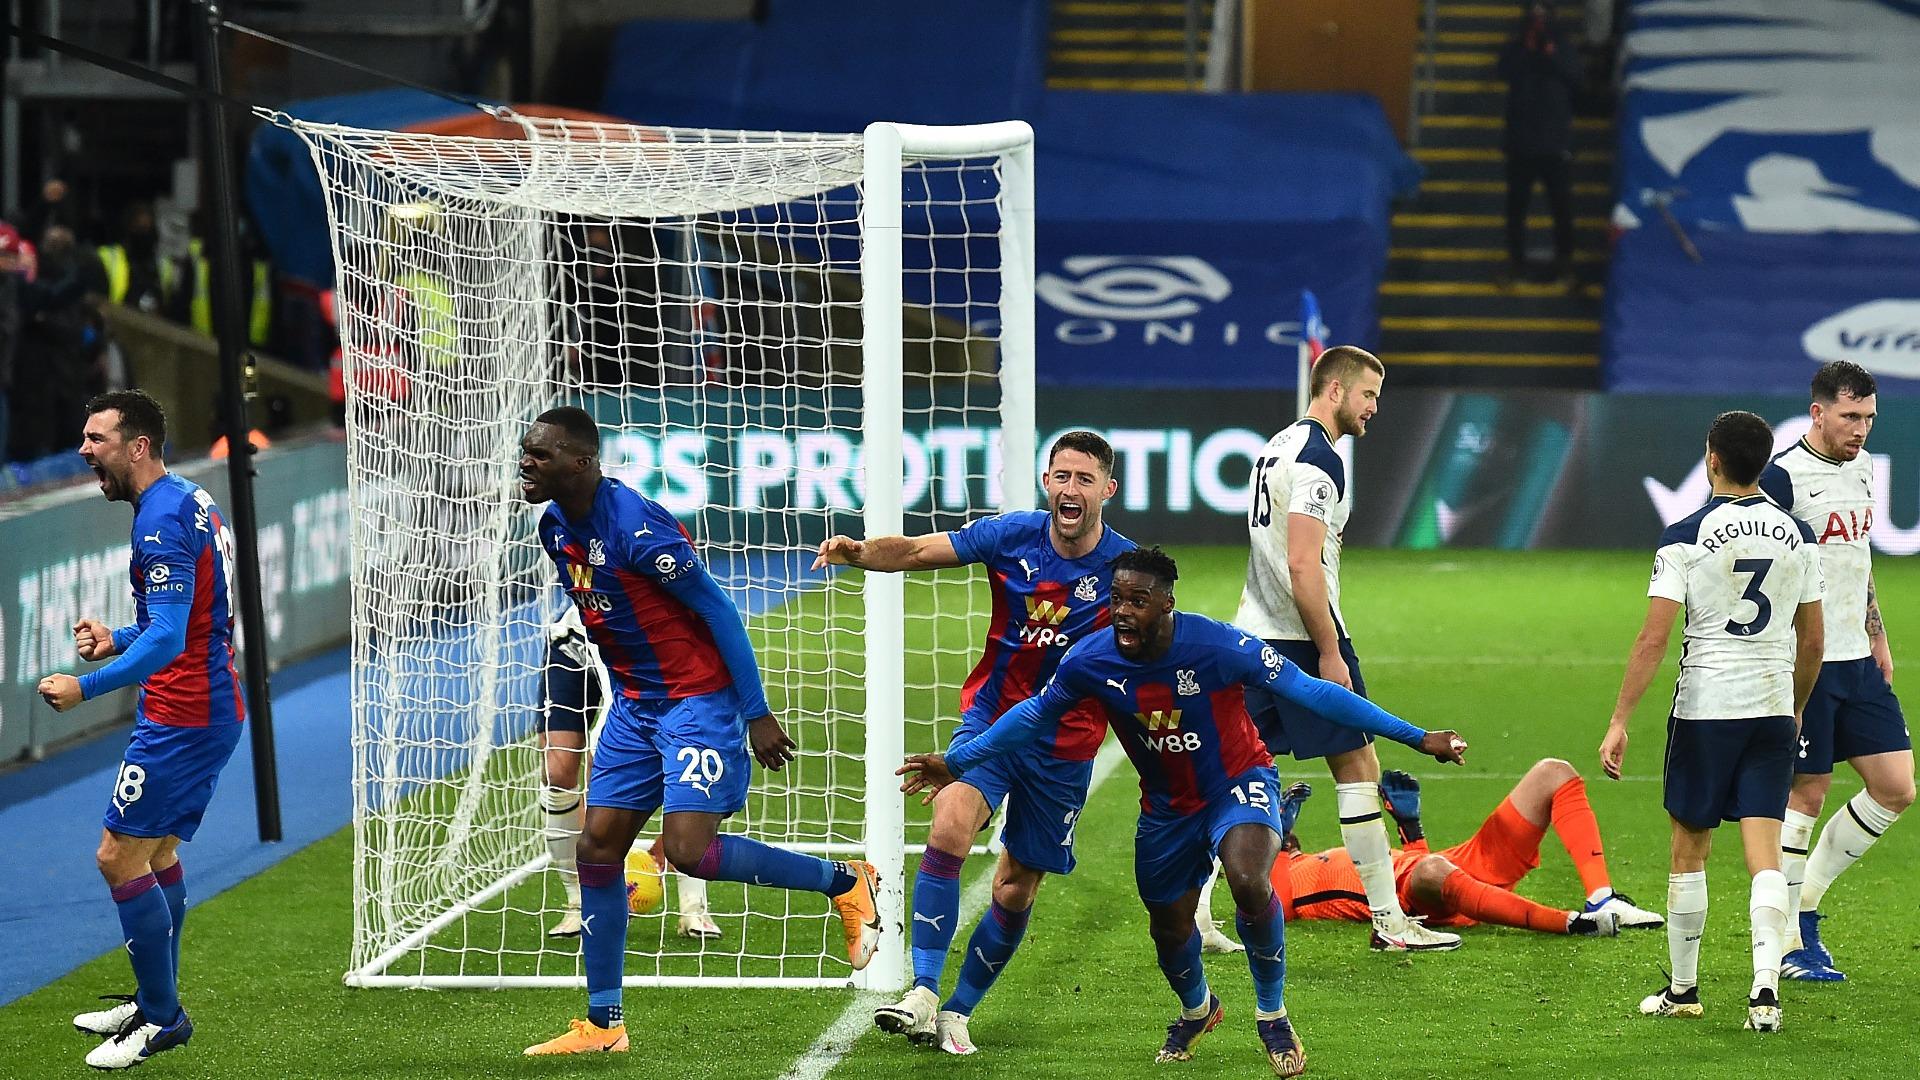 Late Schlupp strike sees Palace deny Tottenham